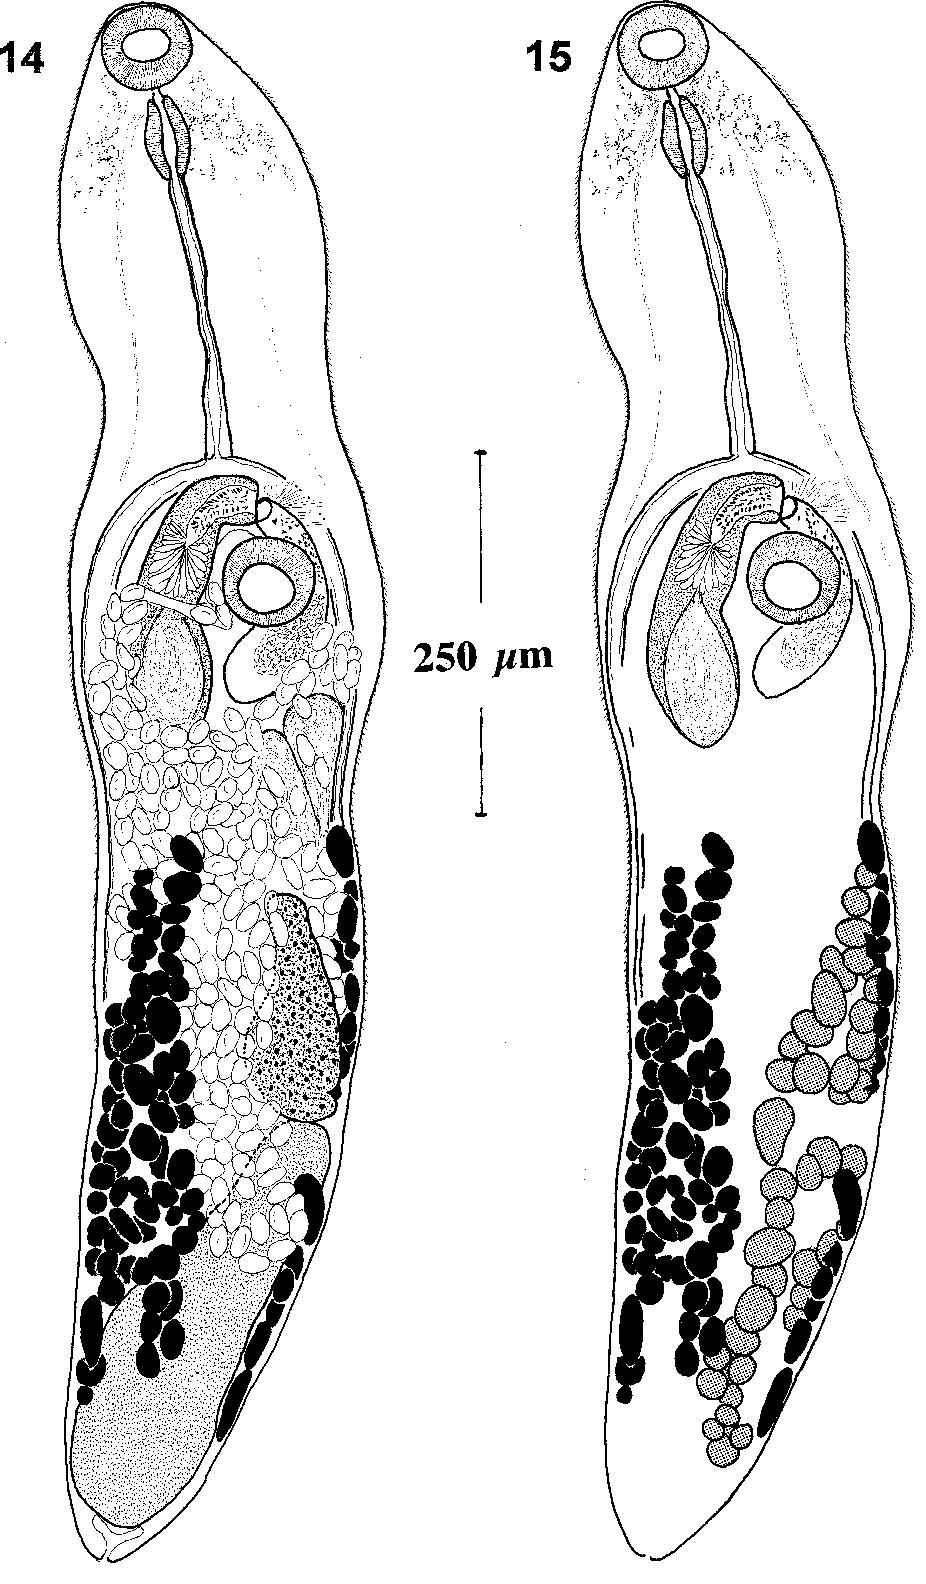 figure 14–15